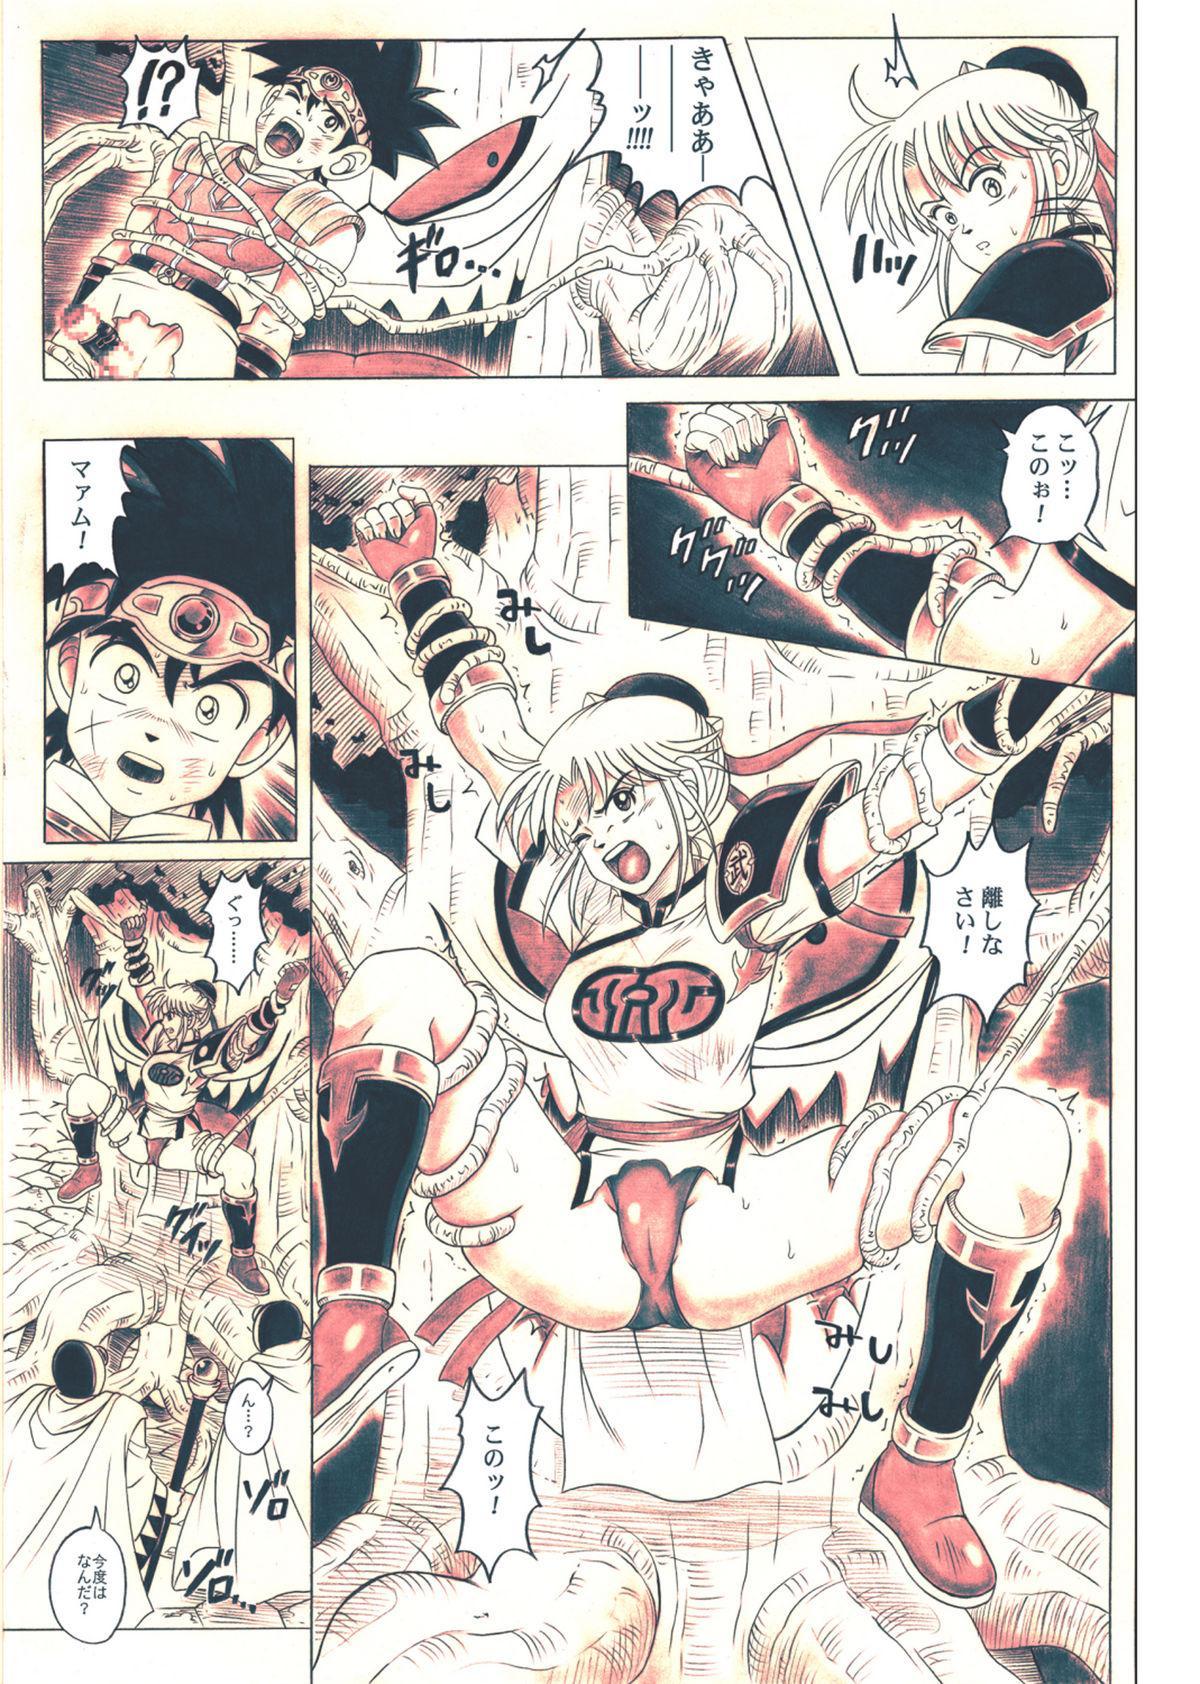 [Cyclone (Reizei, Izumi)] STAR TAC IDO ~Youkuso Haja no Doukutsu he~ Chuuhen Download edition (Dragon Warrior: Dai's Great Adventure) [Digital] 98